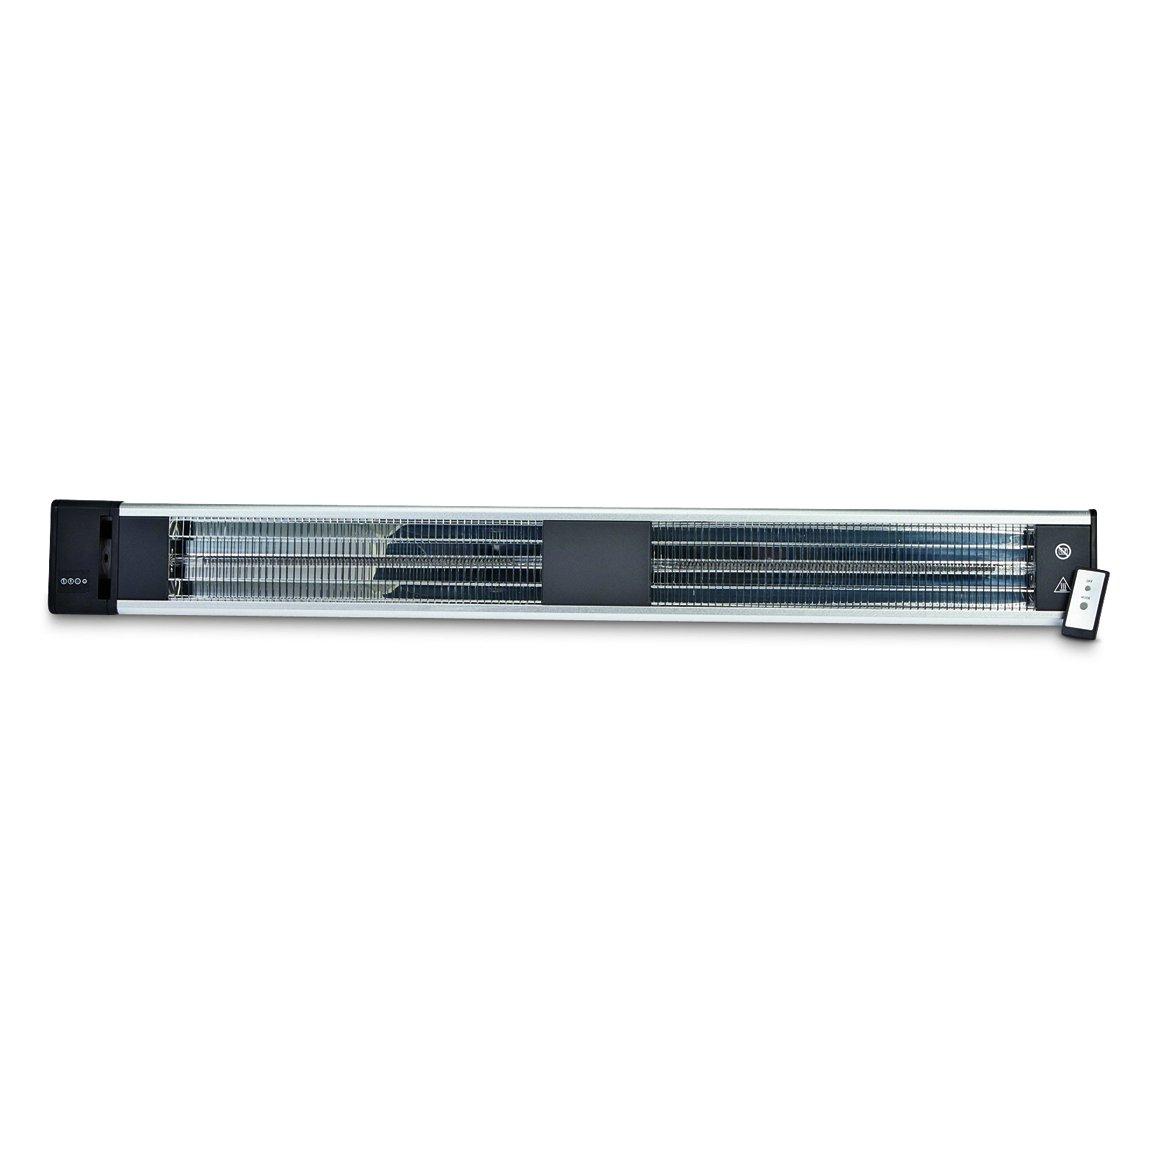 ProFusion Heat Indoor/Patio Radiant Heater, 3,000 Watt, 240 Volt, 10,234 BTU